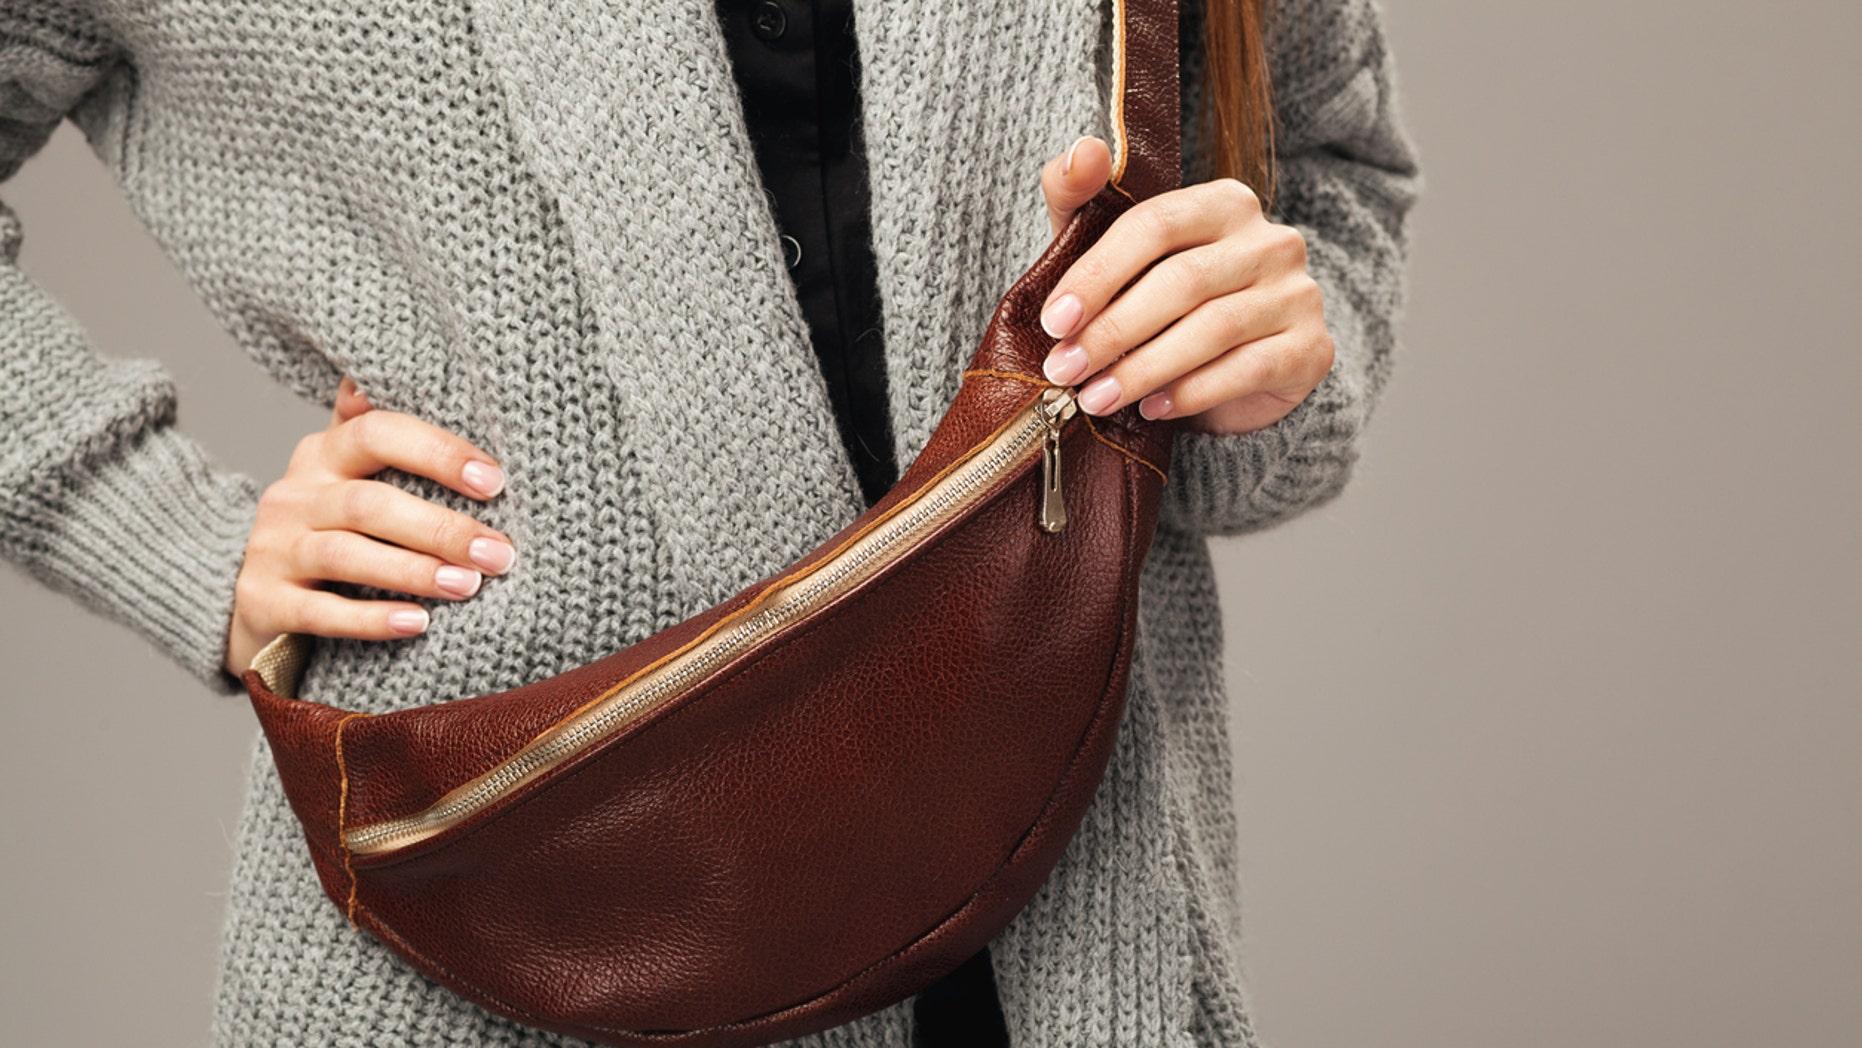 Fanny packs are making a fashion comeback.